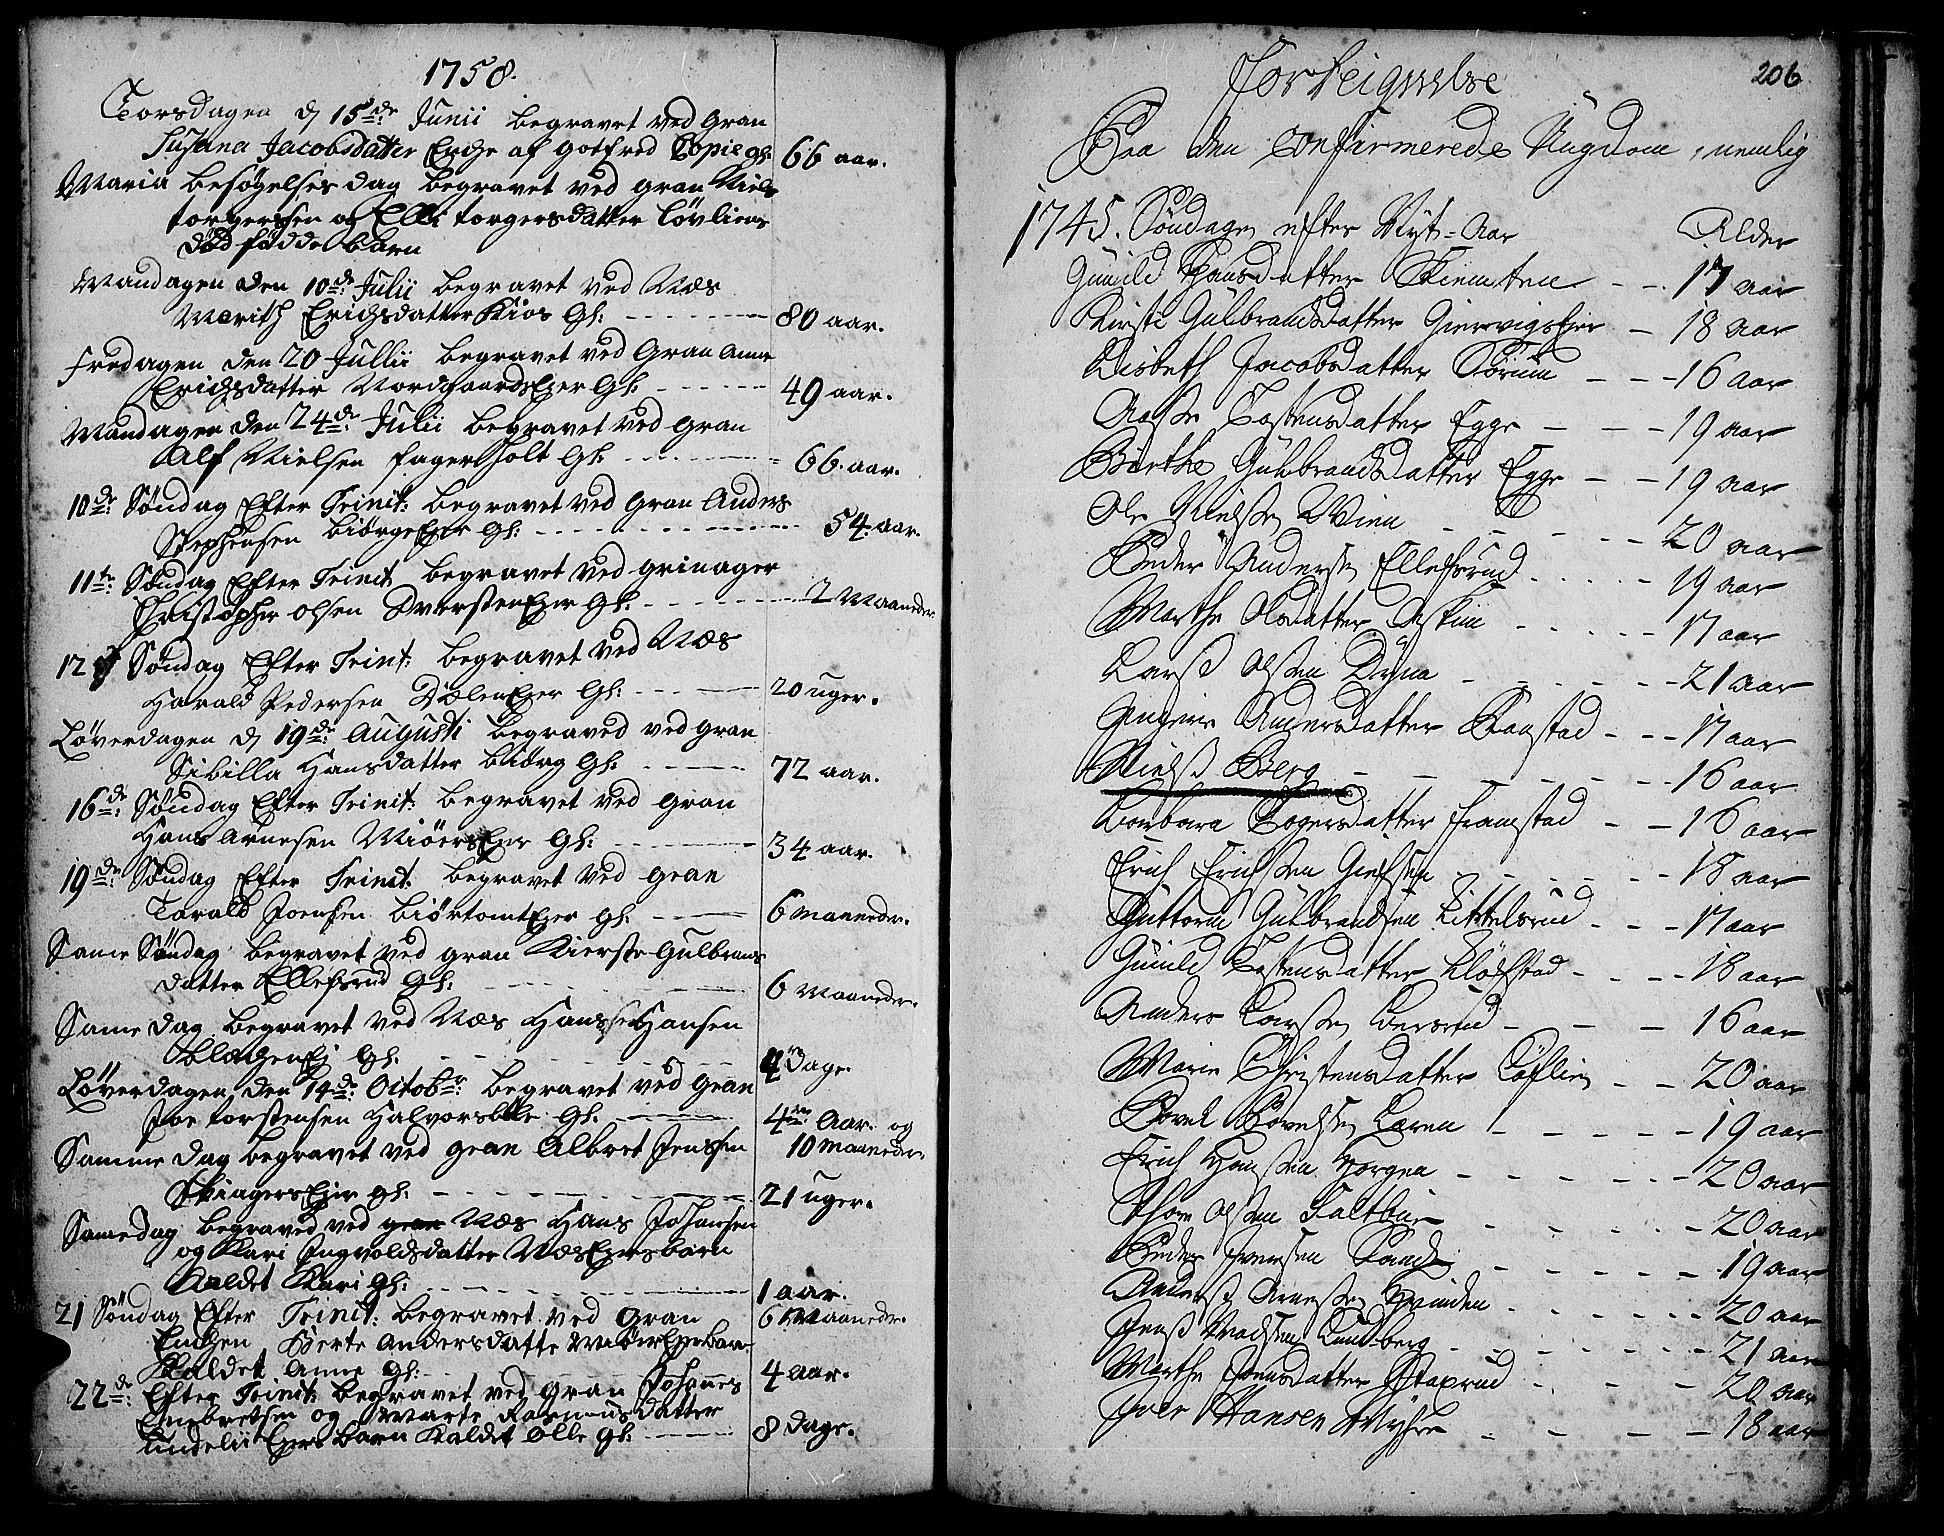 SAH, Gran prestekontor, Ministerialbok nr. 3, 1745-1758, s. 206